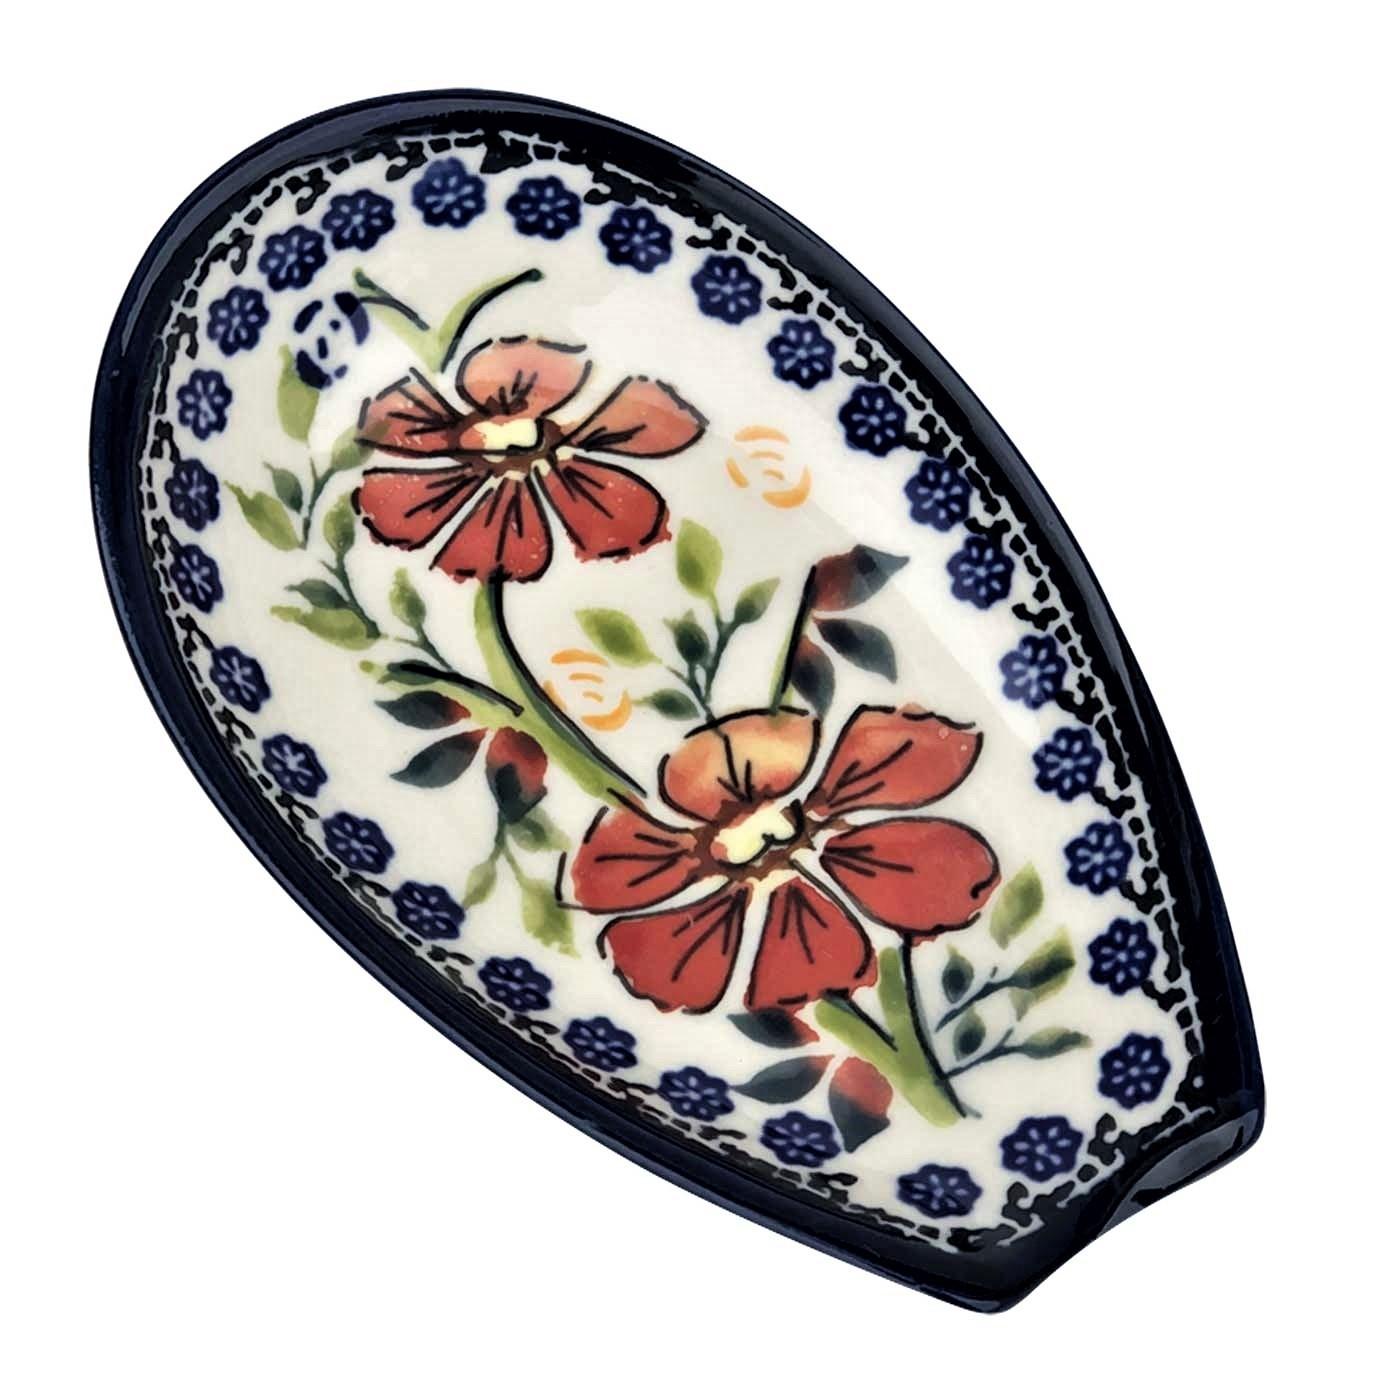 "Pottery Avenue Love Blossoms 5"" Stoneware Spoon Rest - 1015-252EX"